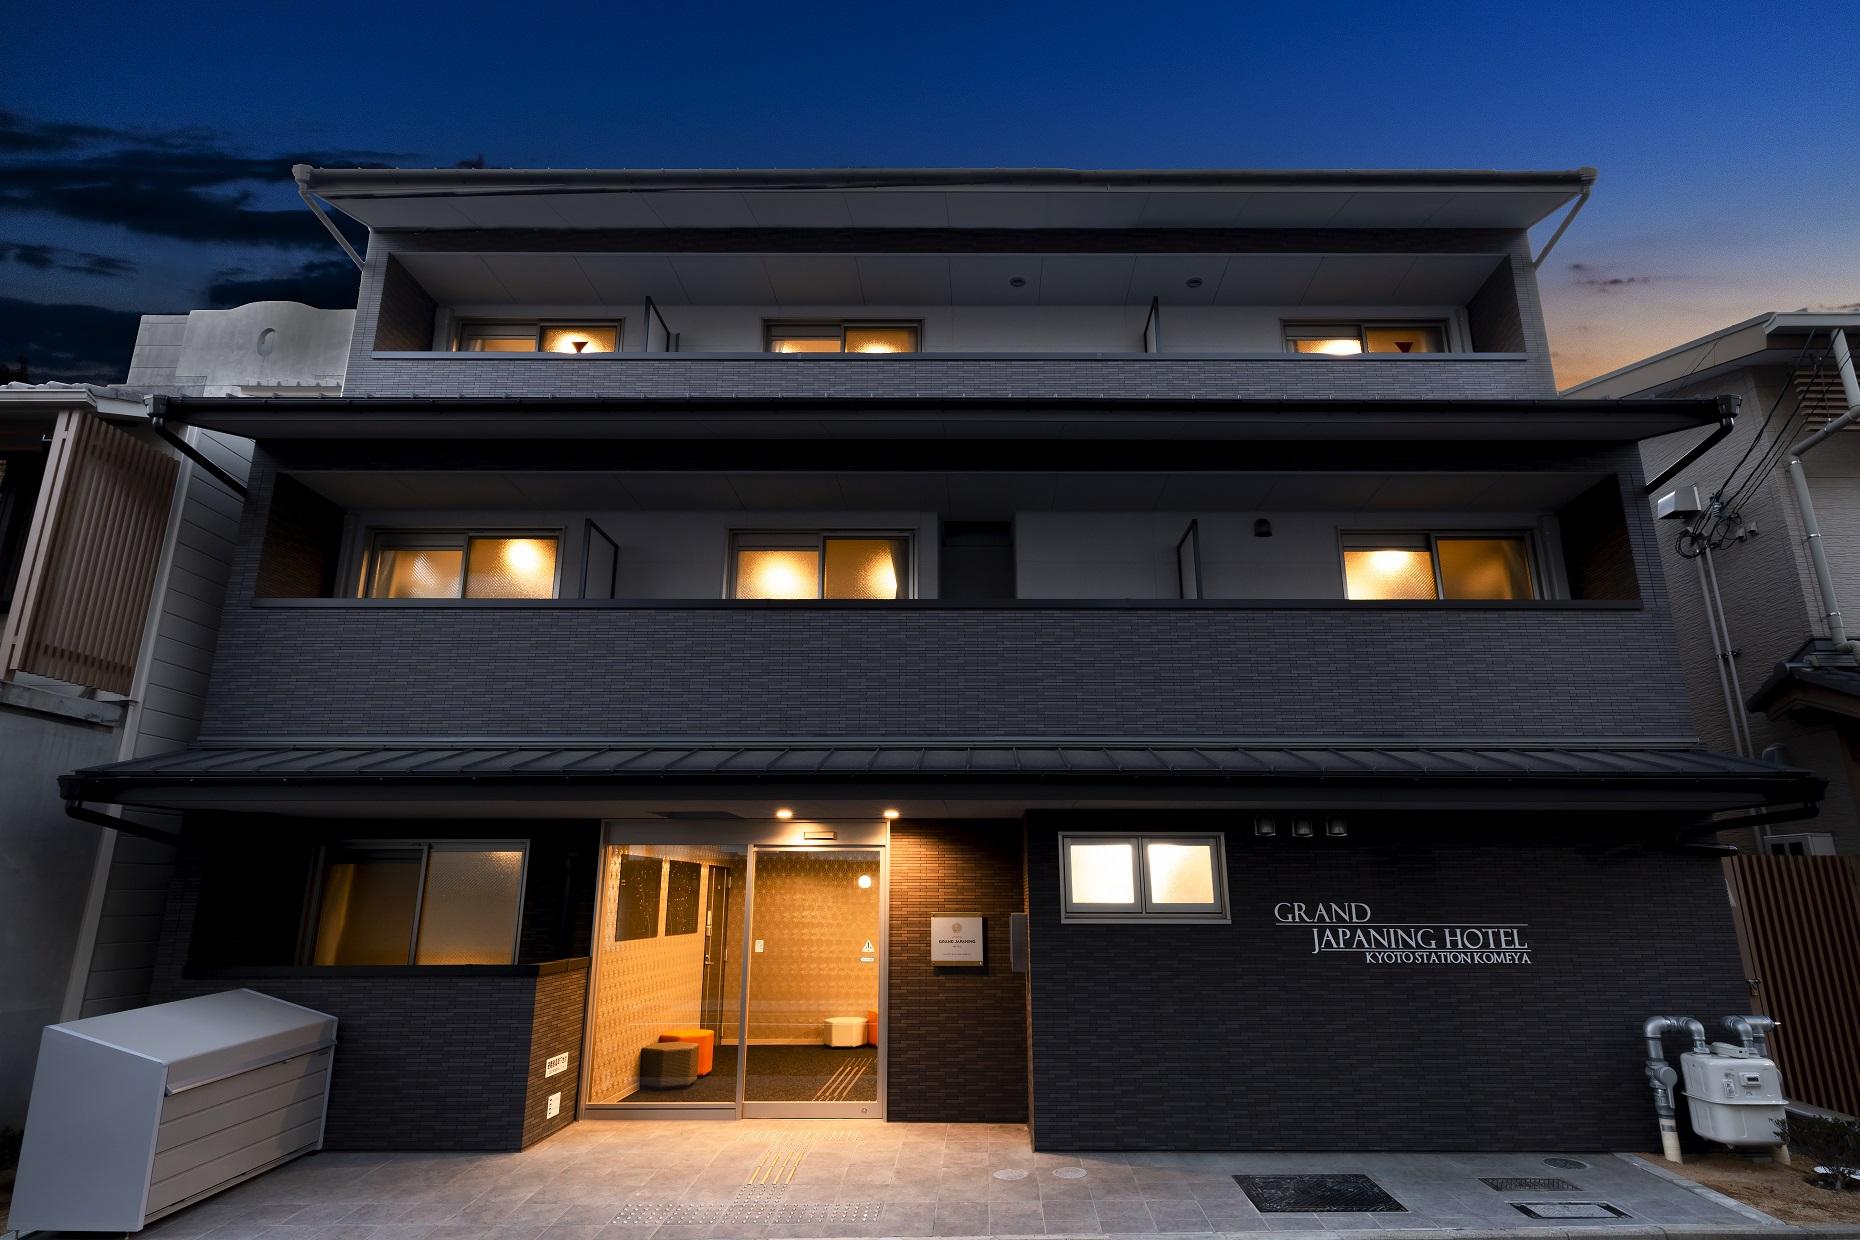 GRAND JAPANING HOTEL KYOTO STATION KOMEYA